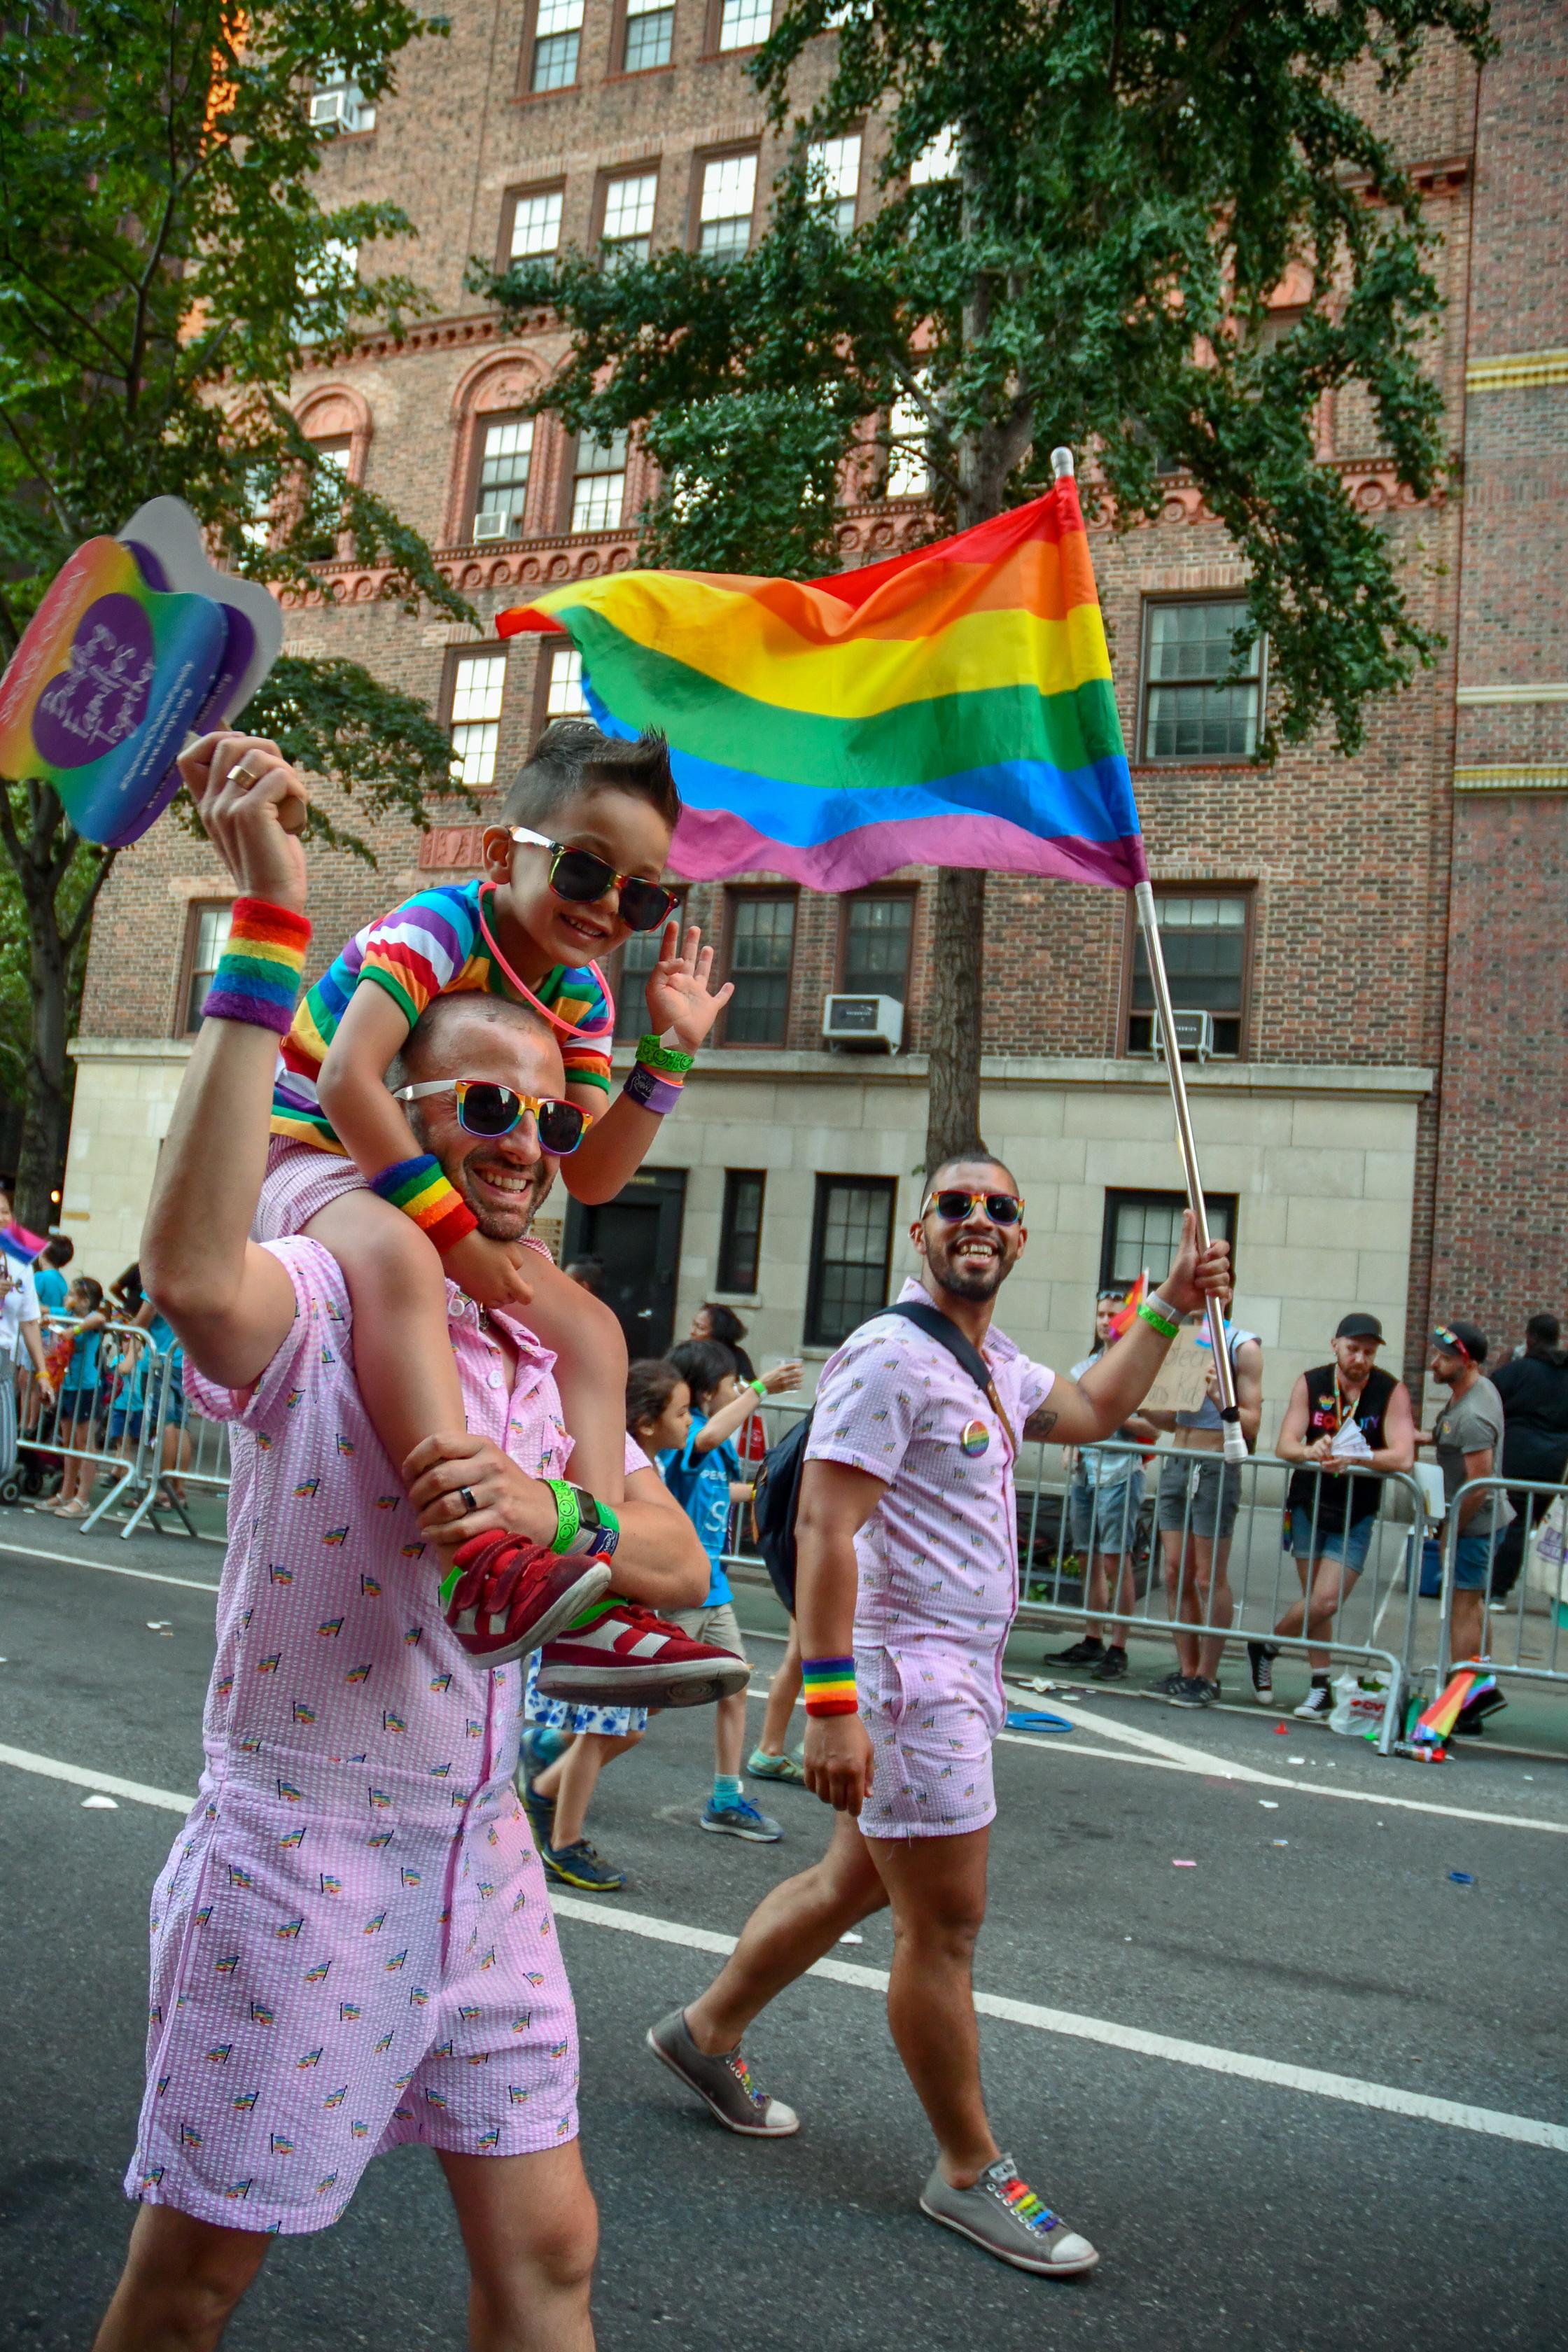 SC-PrideParade-2019_FE-248.jpg